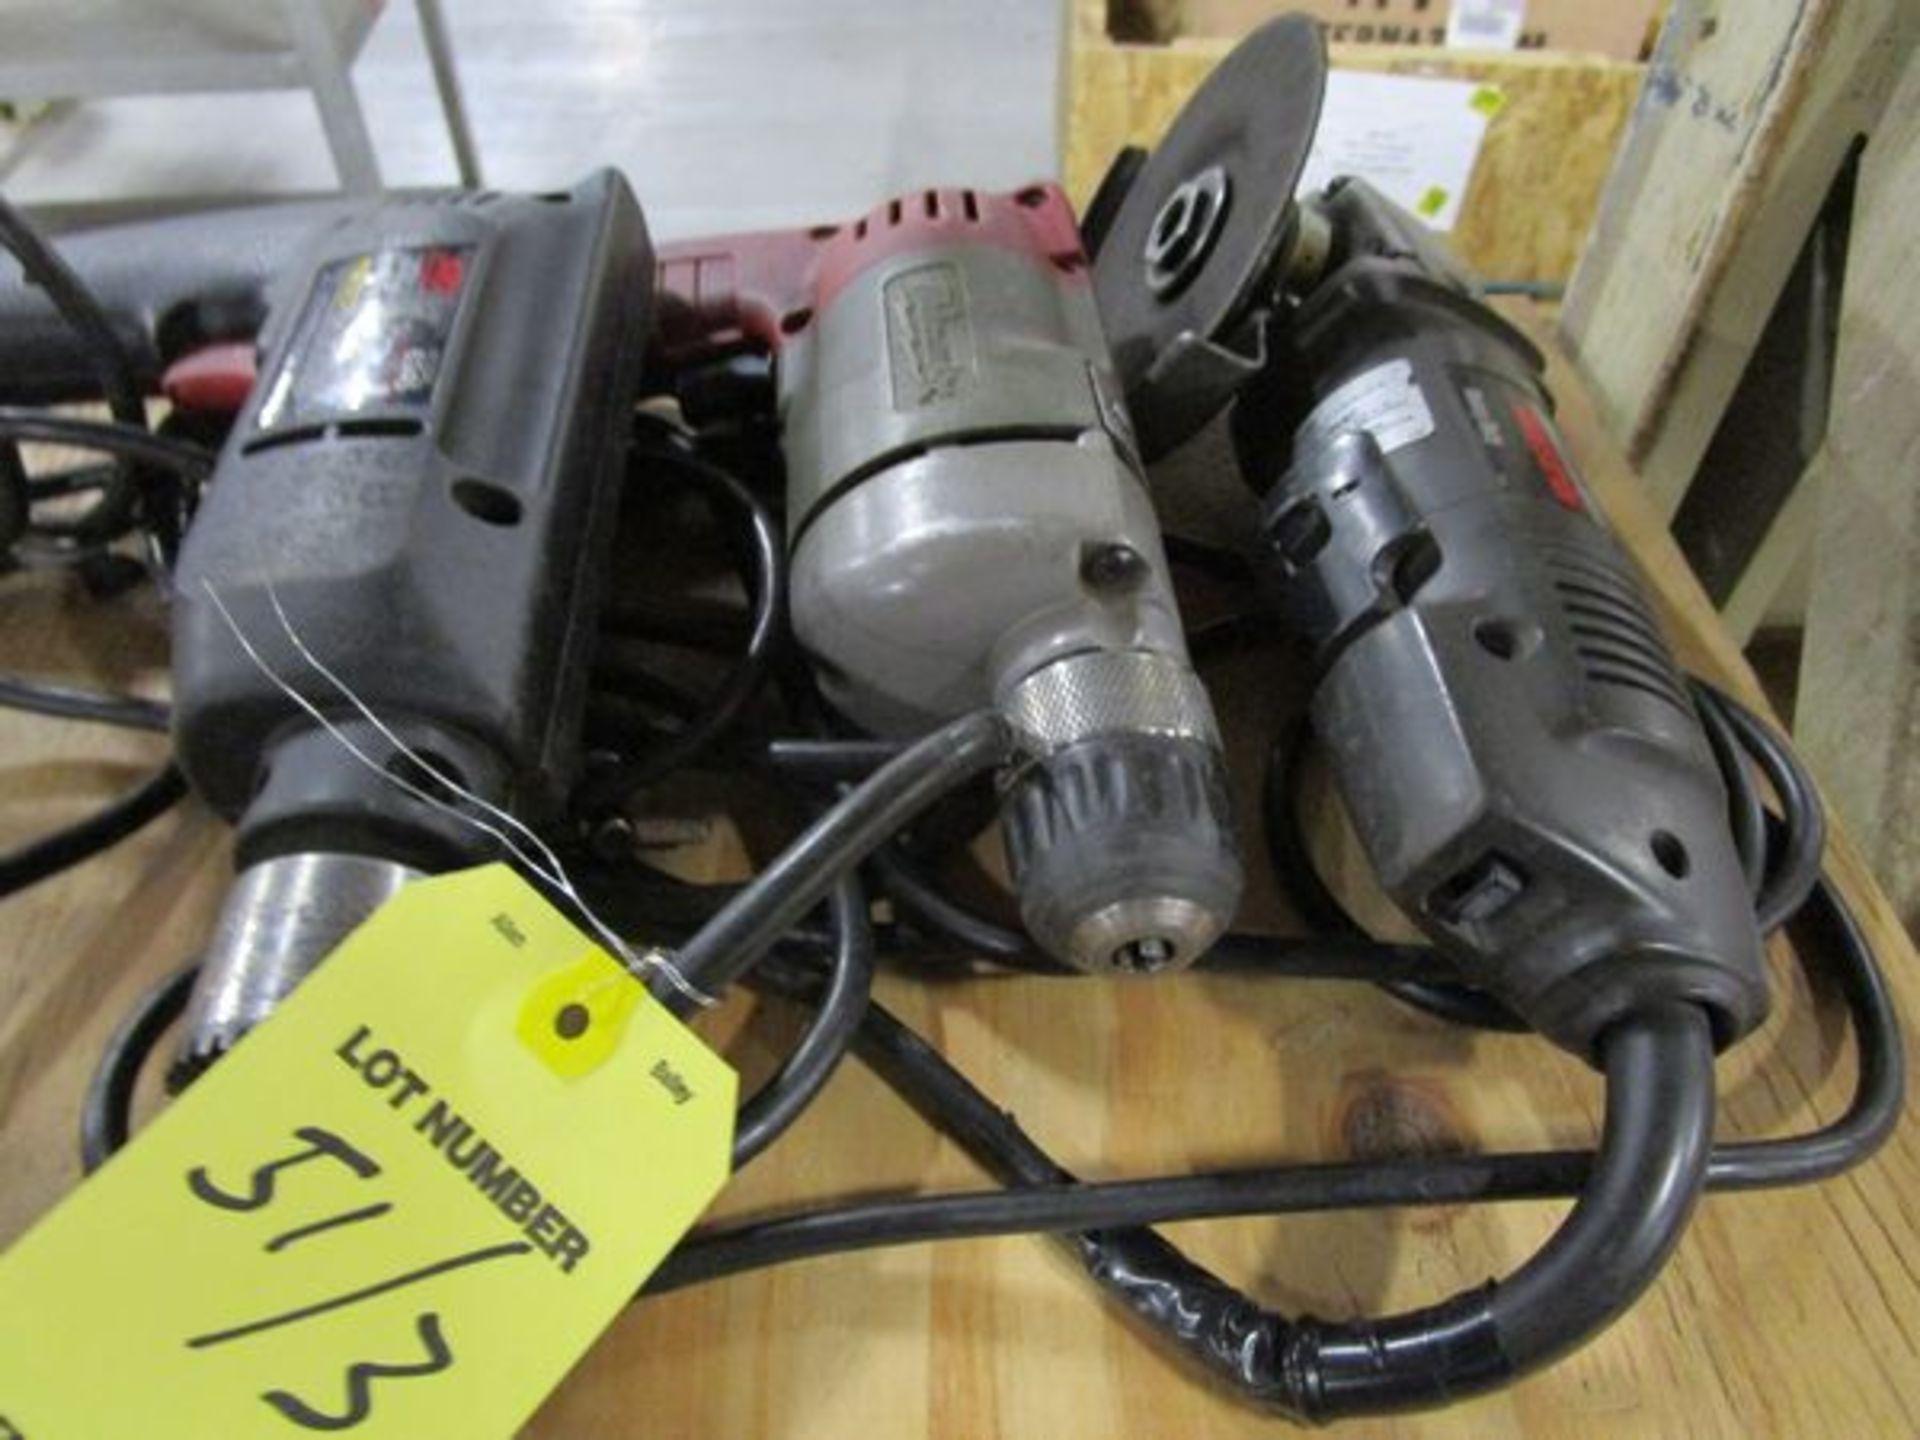 (2) Electric Drills & Sander